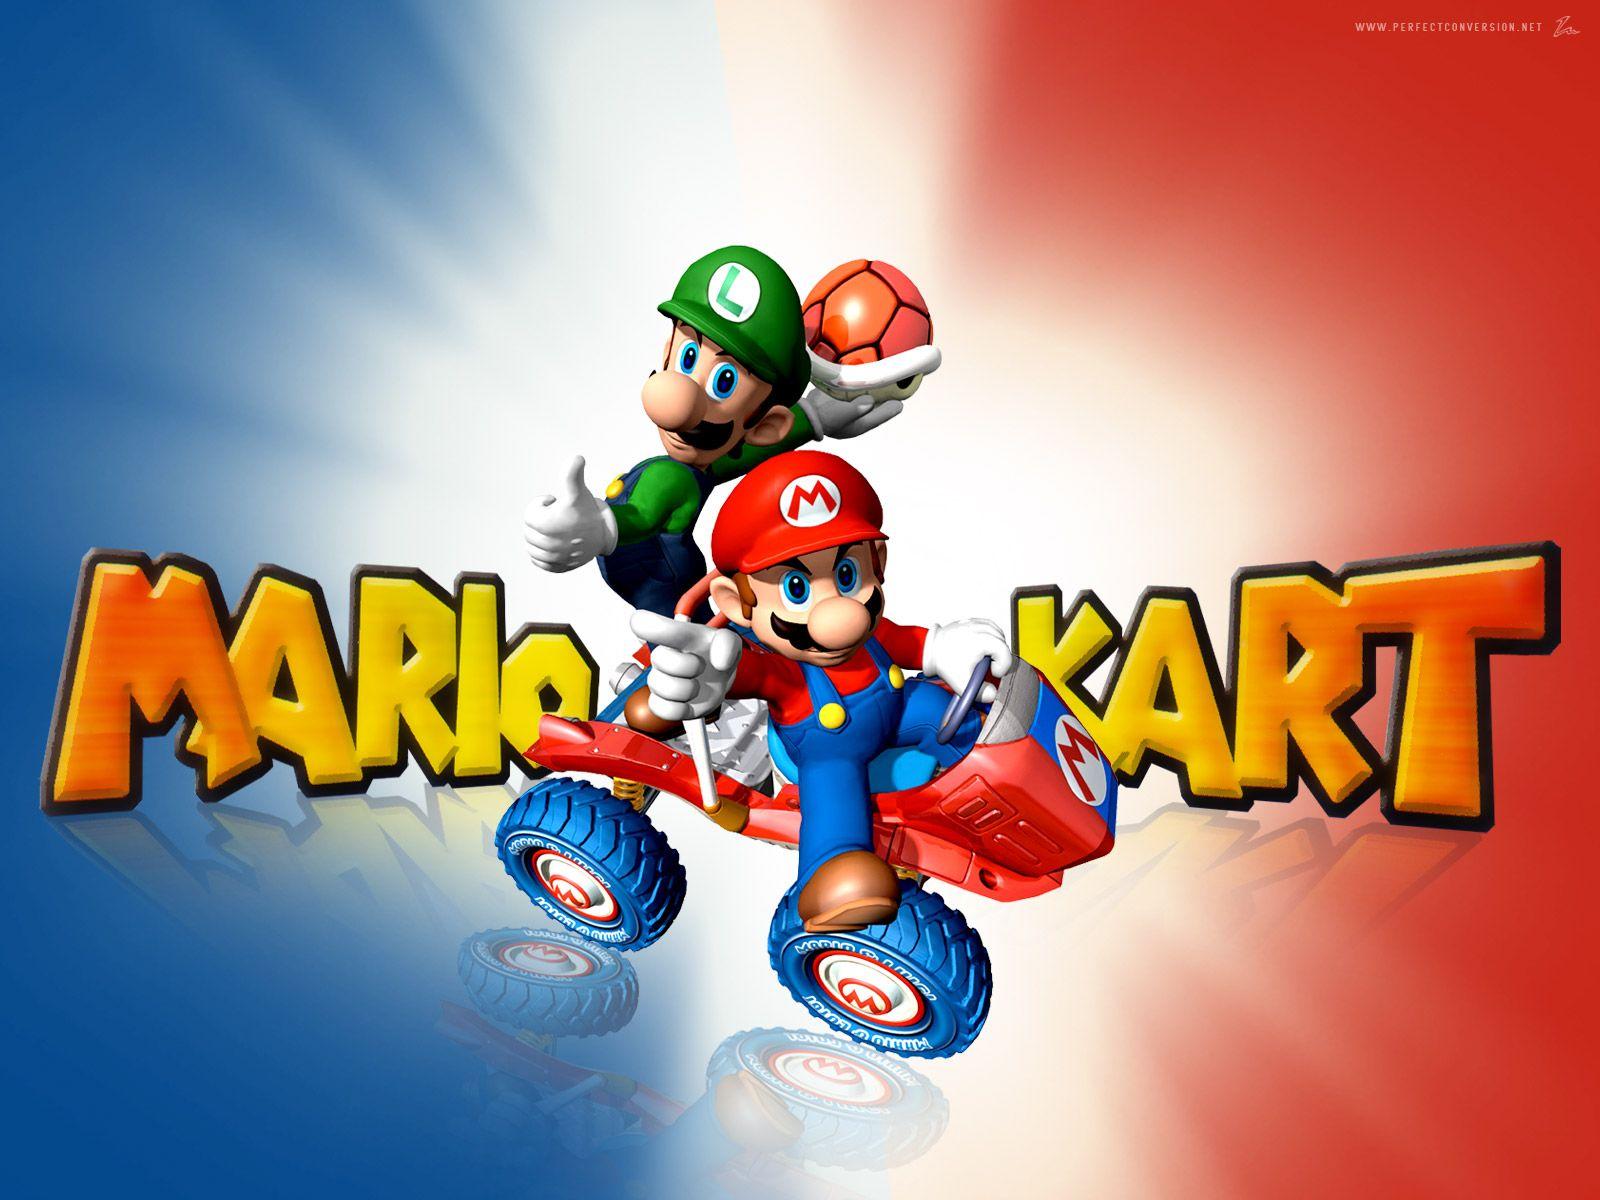 28+ Mario Kart 64 Backgrounds, HQ, Keanna Mighele